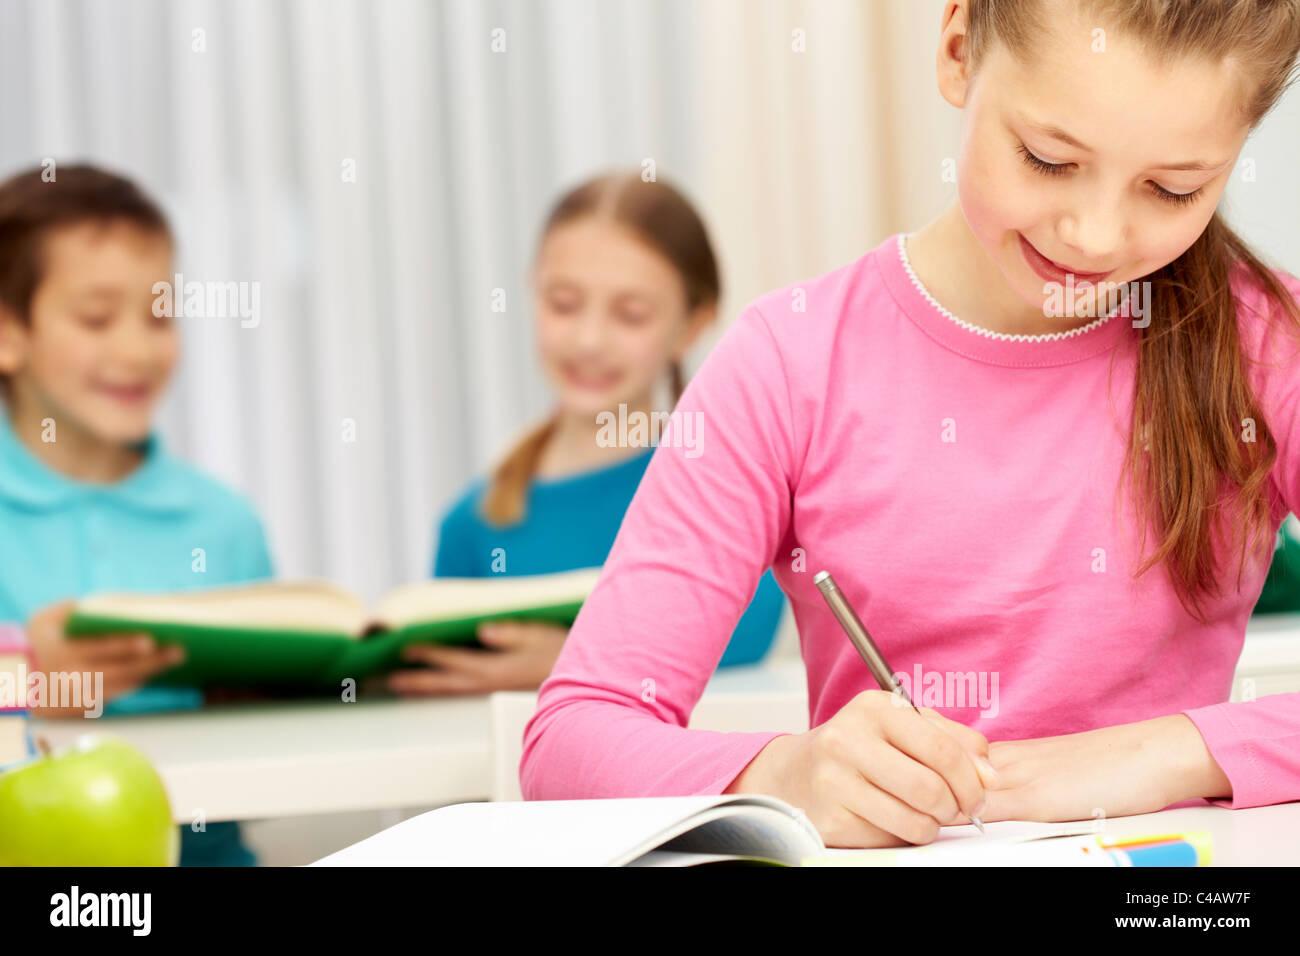 Portrait of smart schoolgirl making notes in her exercise book - Stock Image